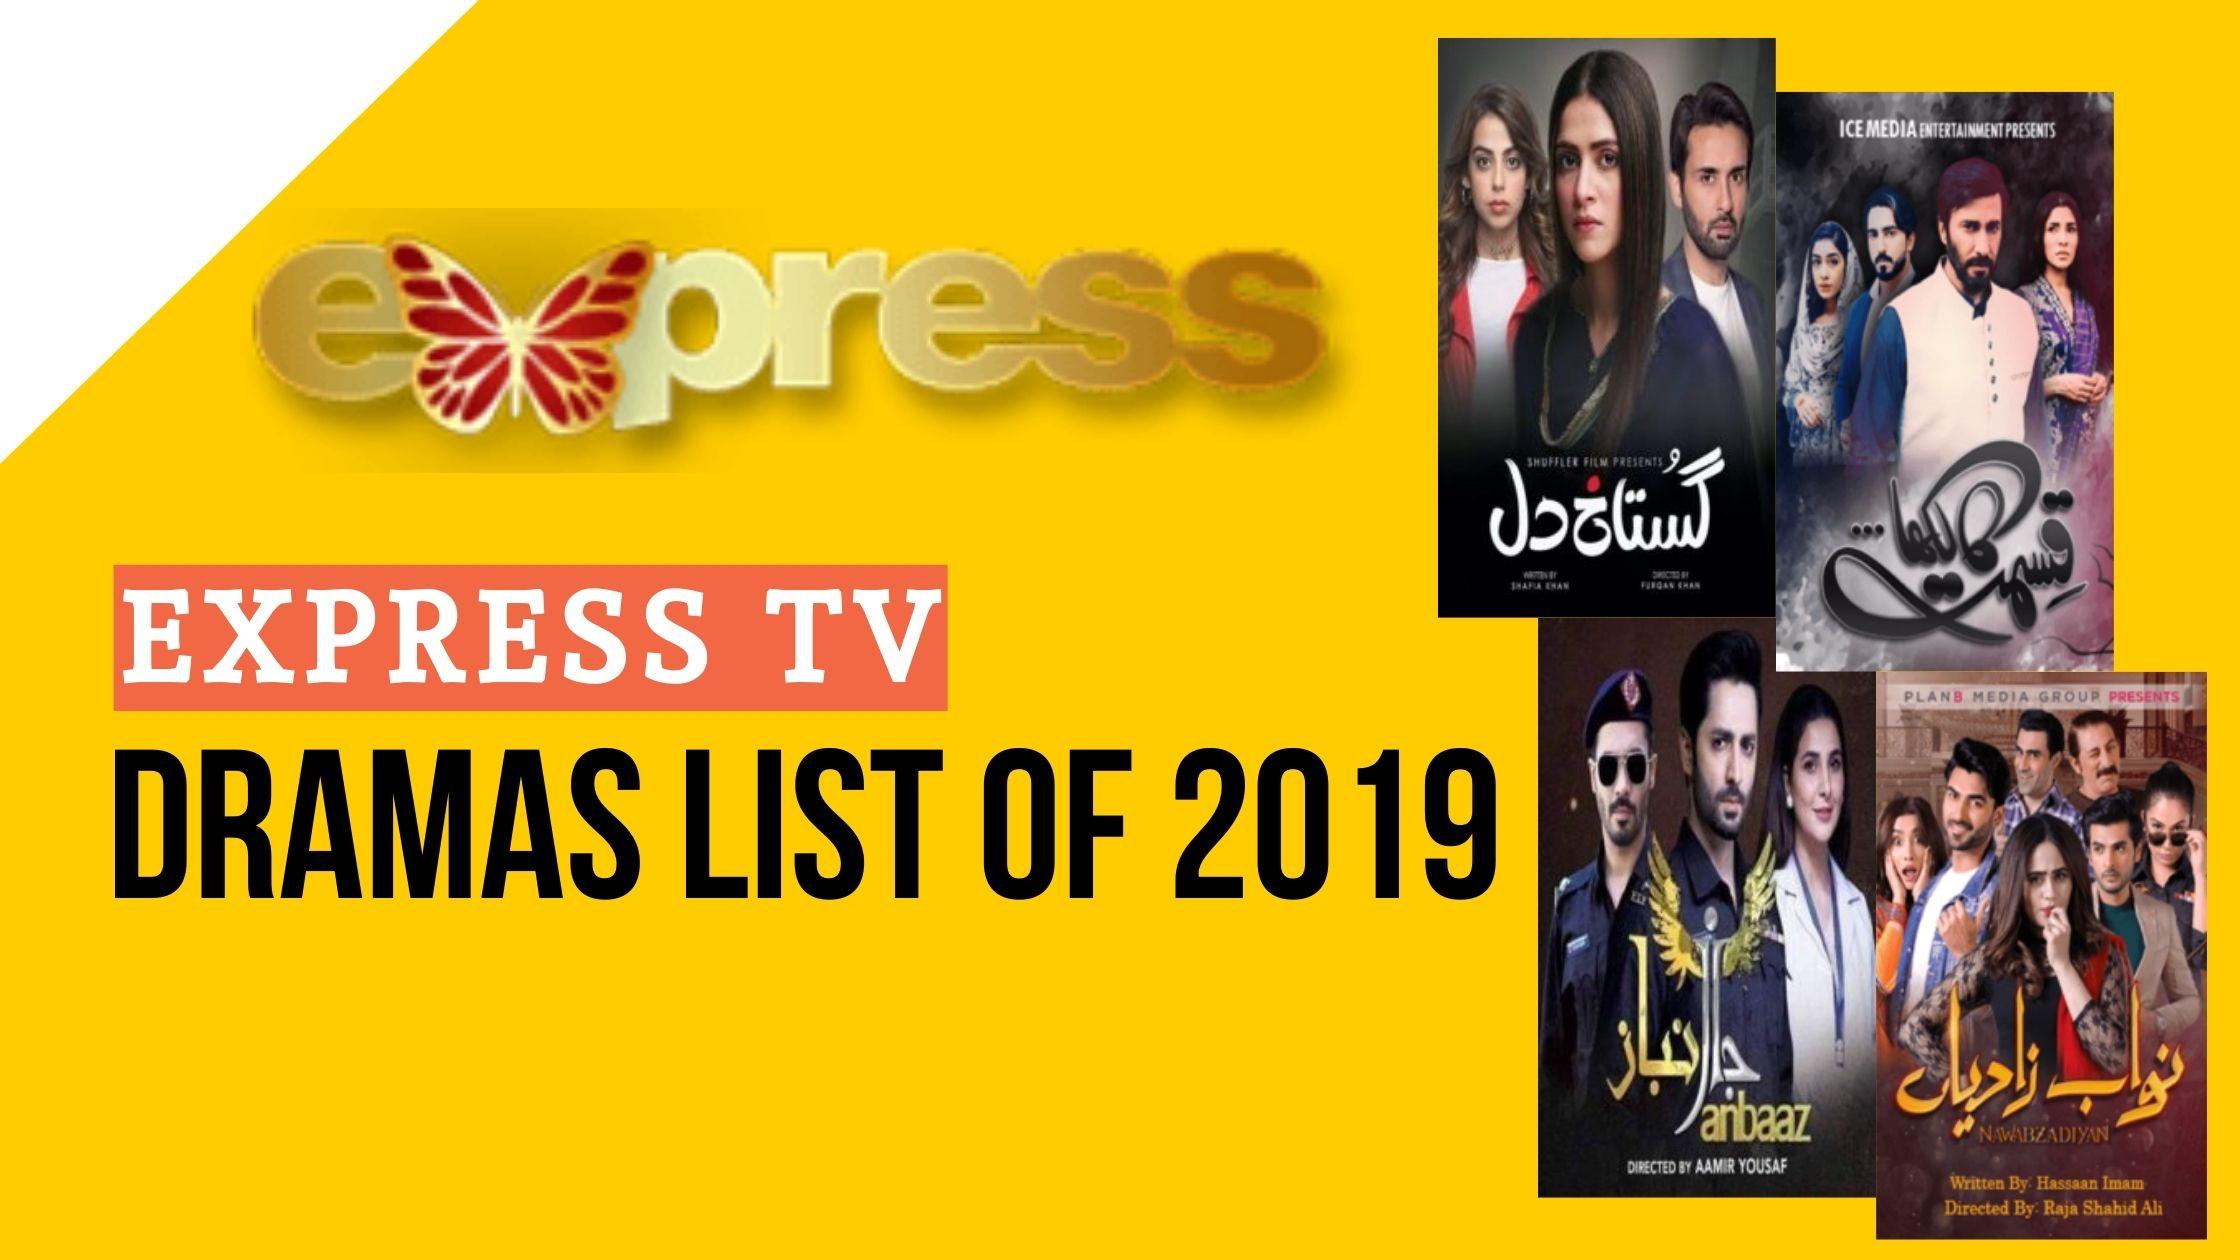 Express TV Dramas List of 2019